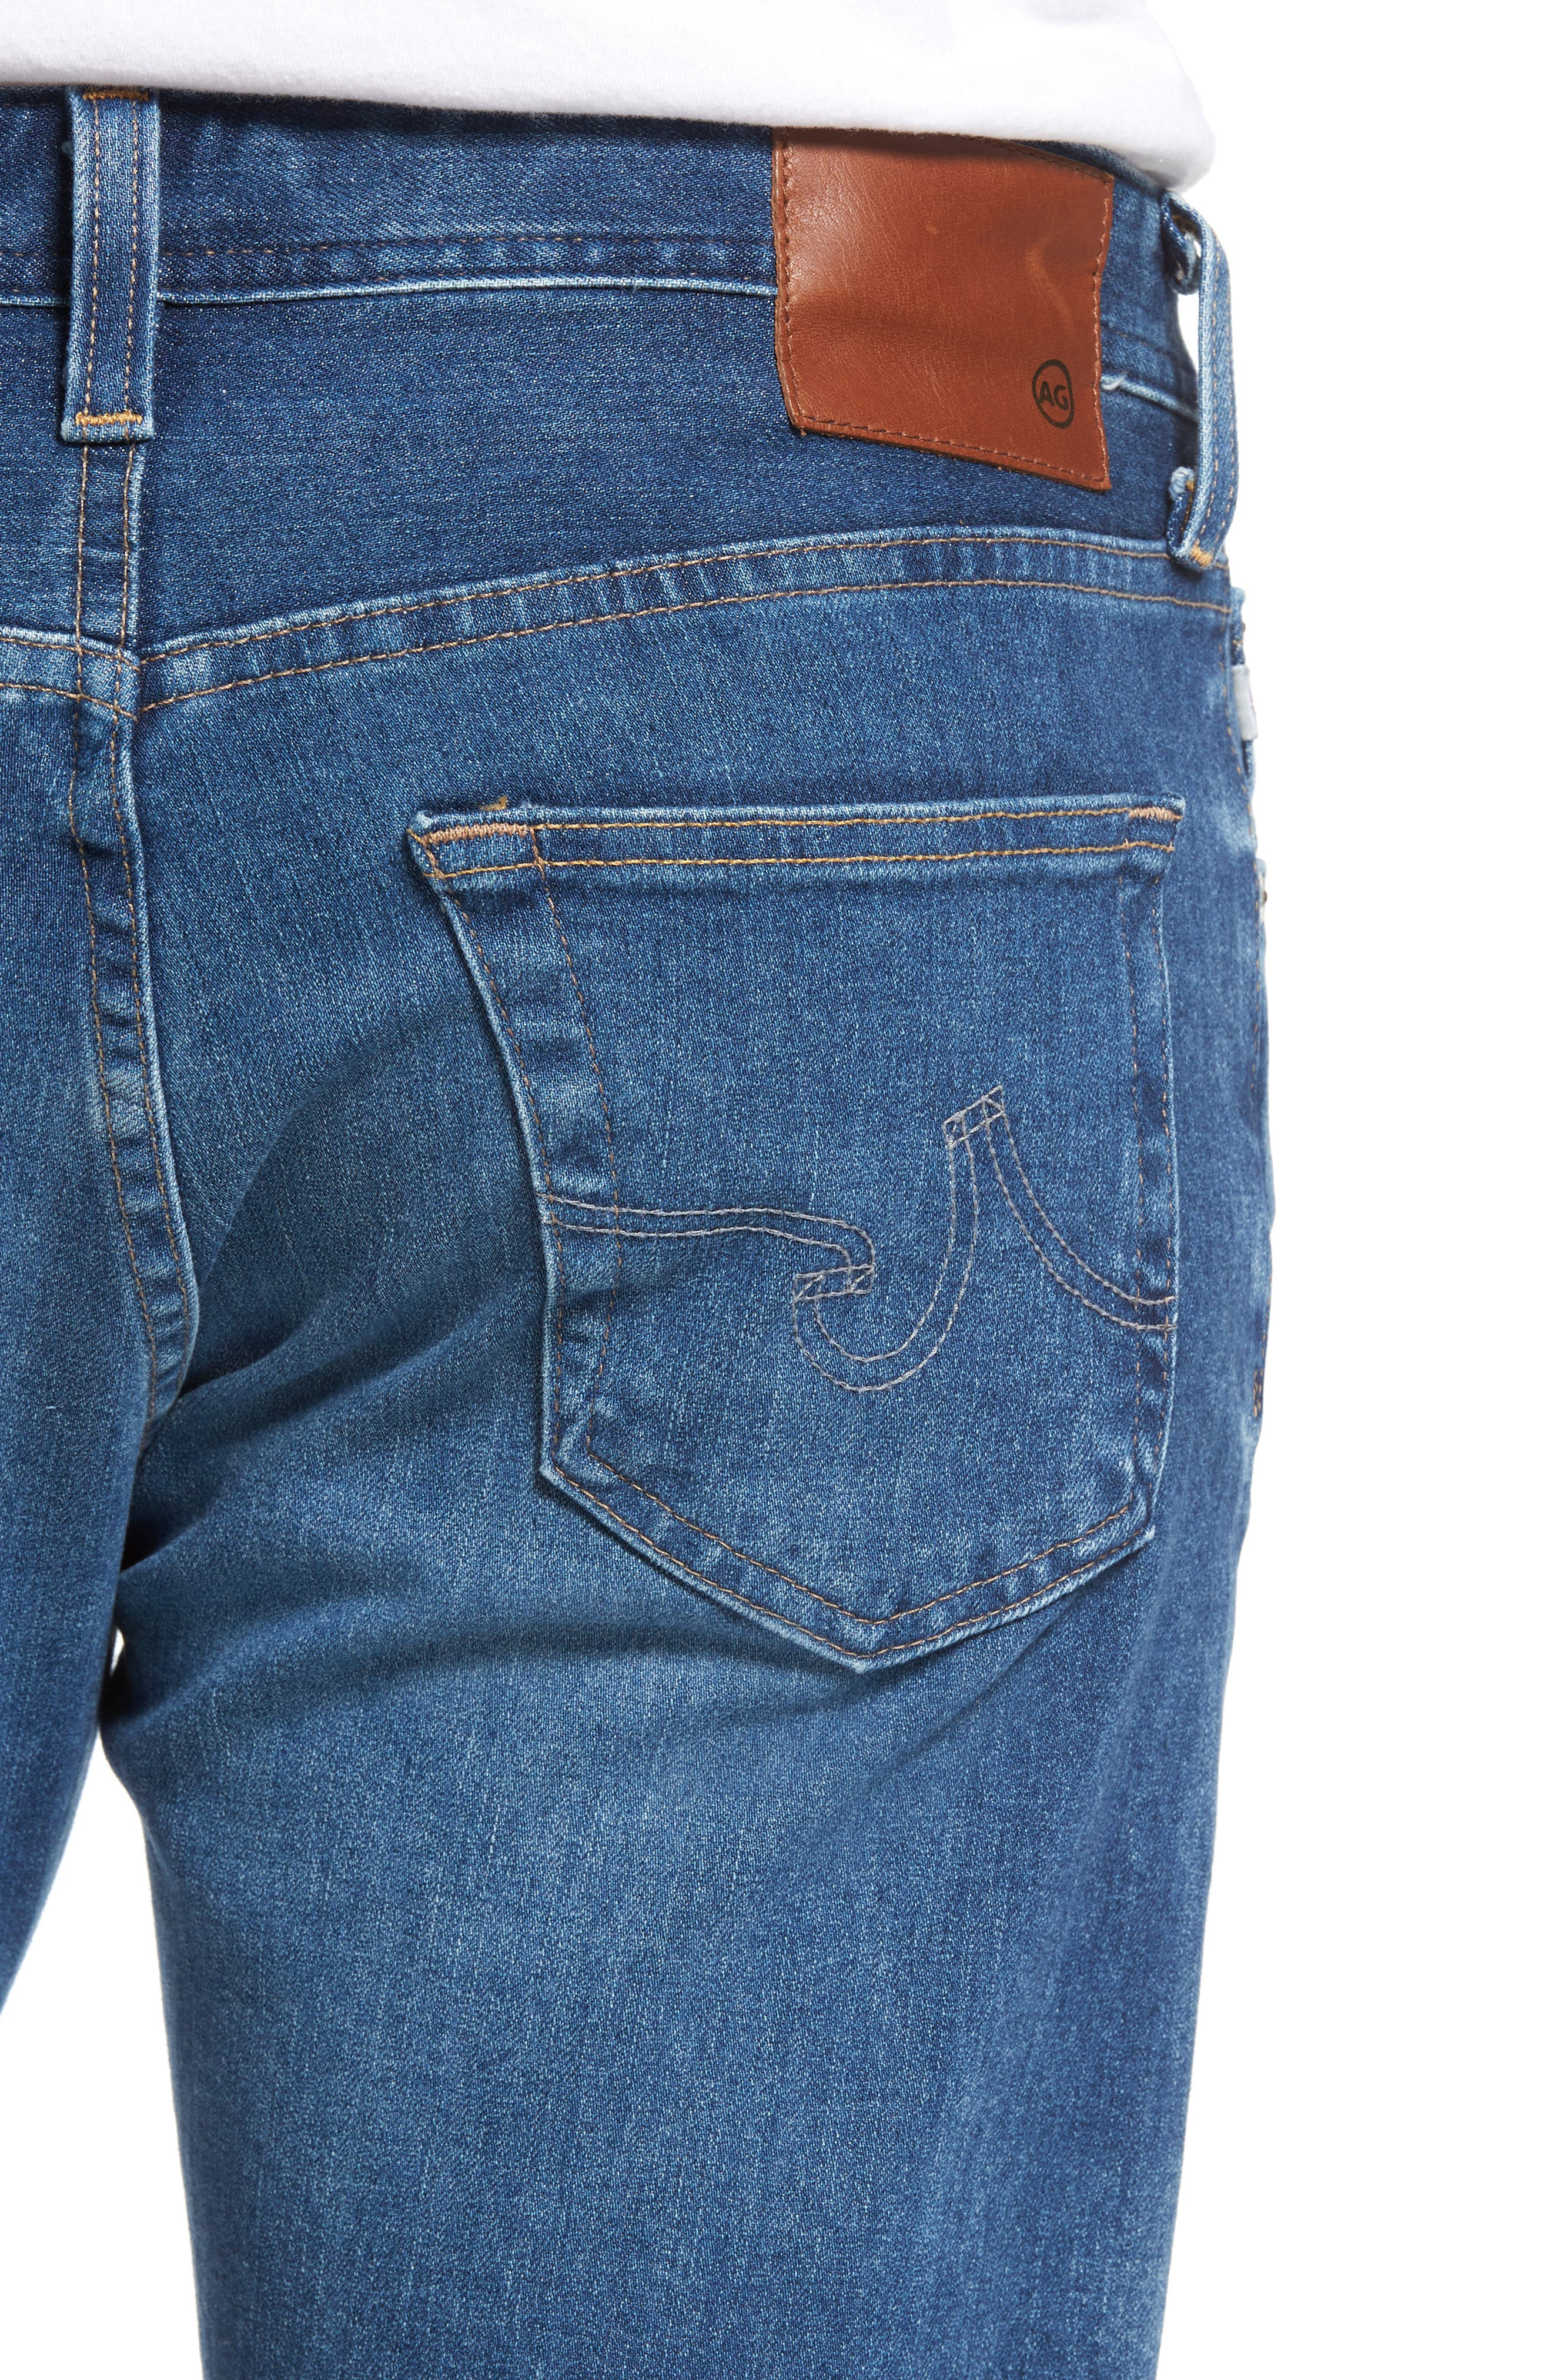 Graduate Slim Straight Leg Jeans,                             Alternate thumbnail 4, color,                             11 Years Delom